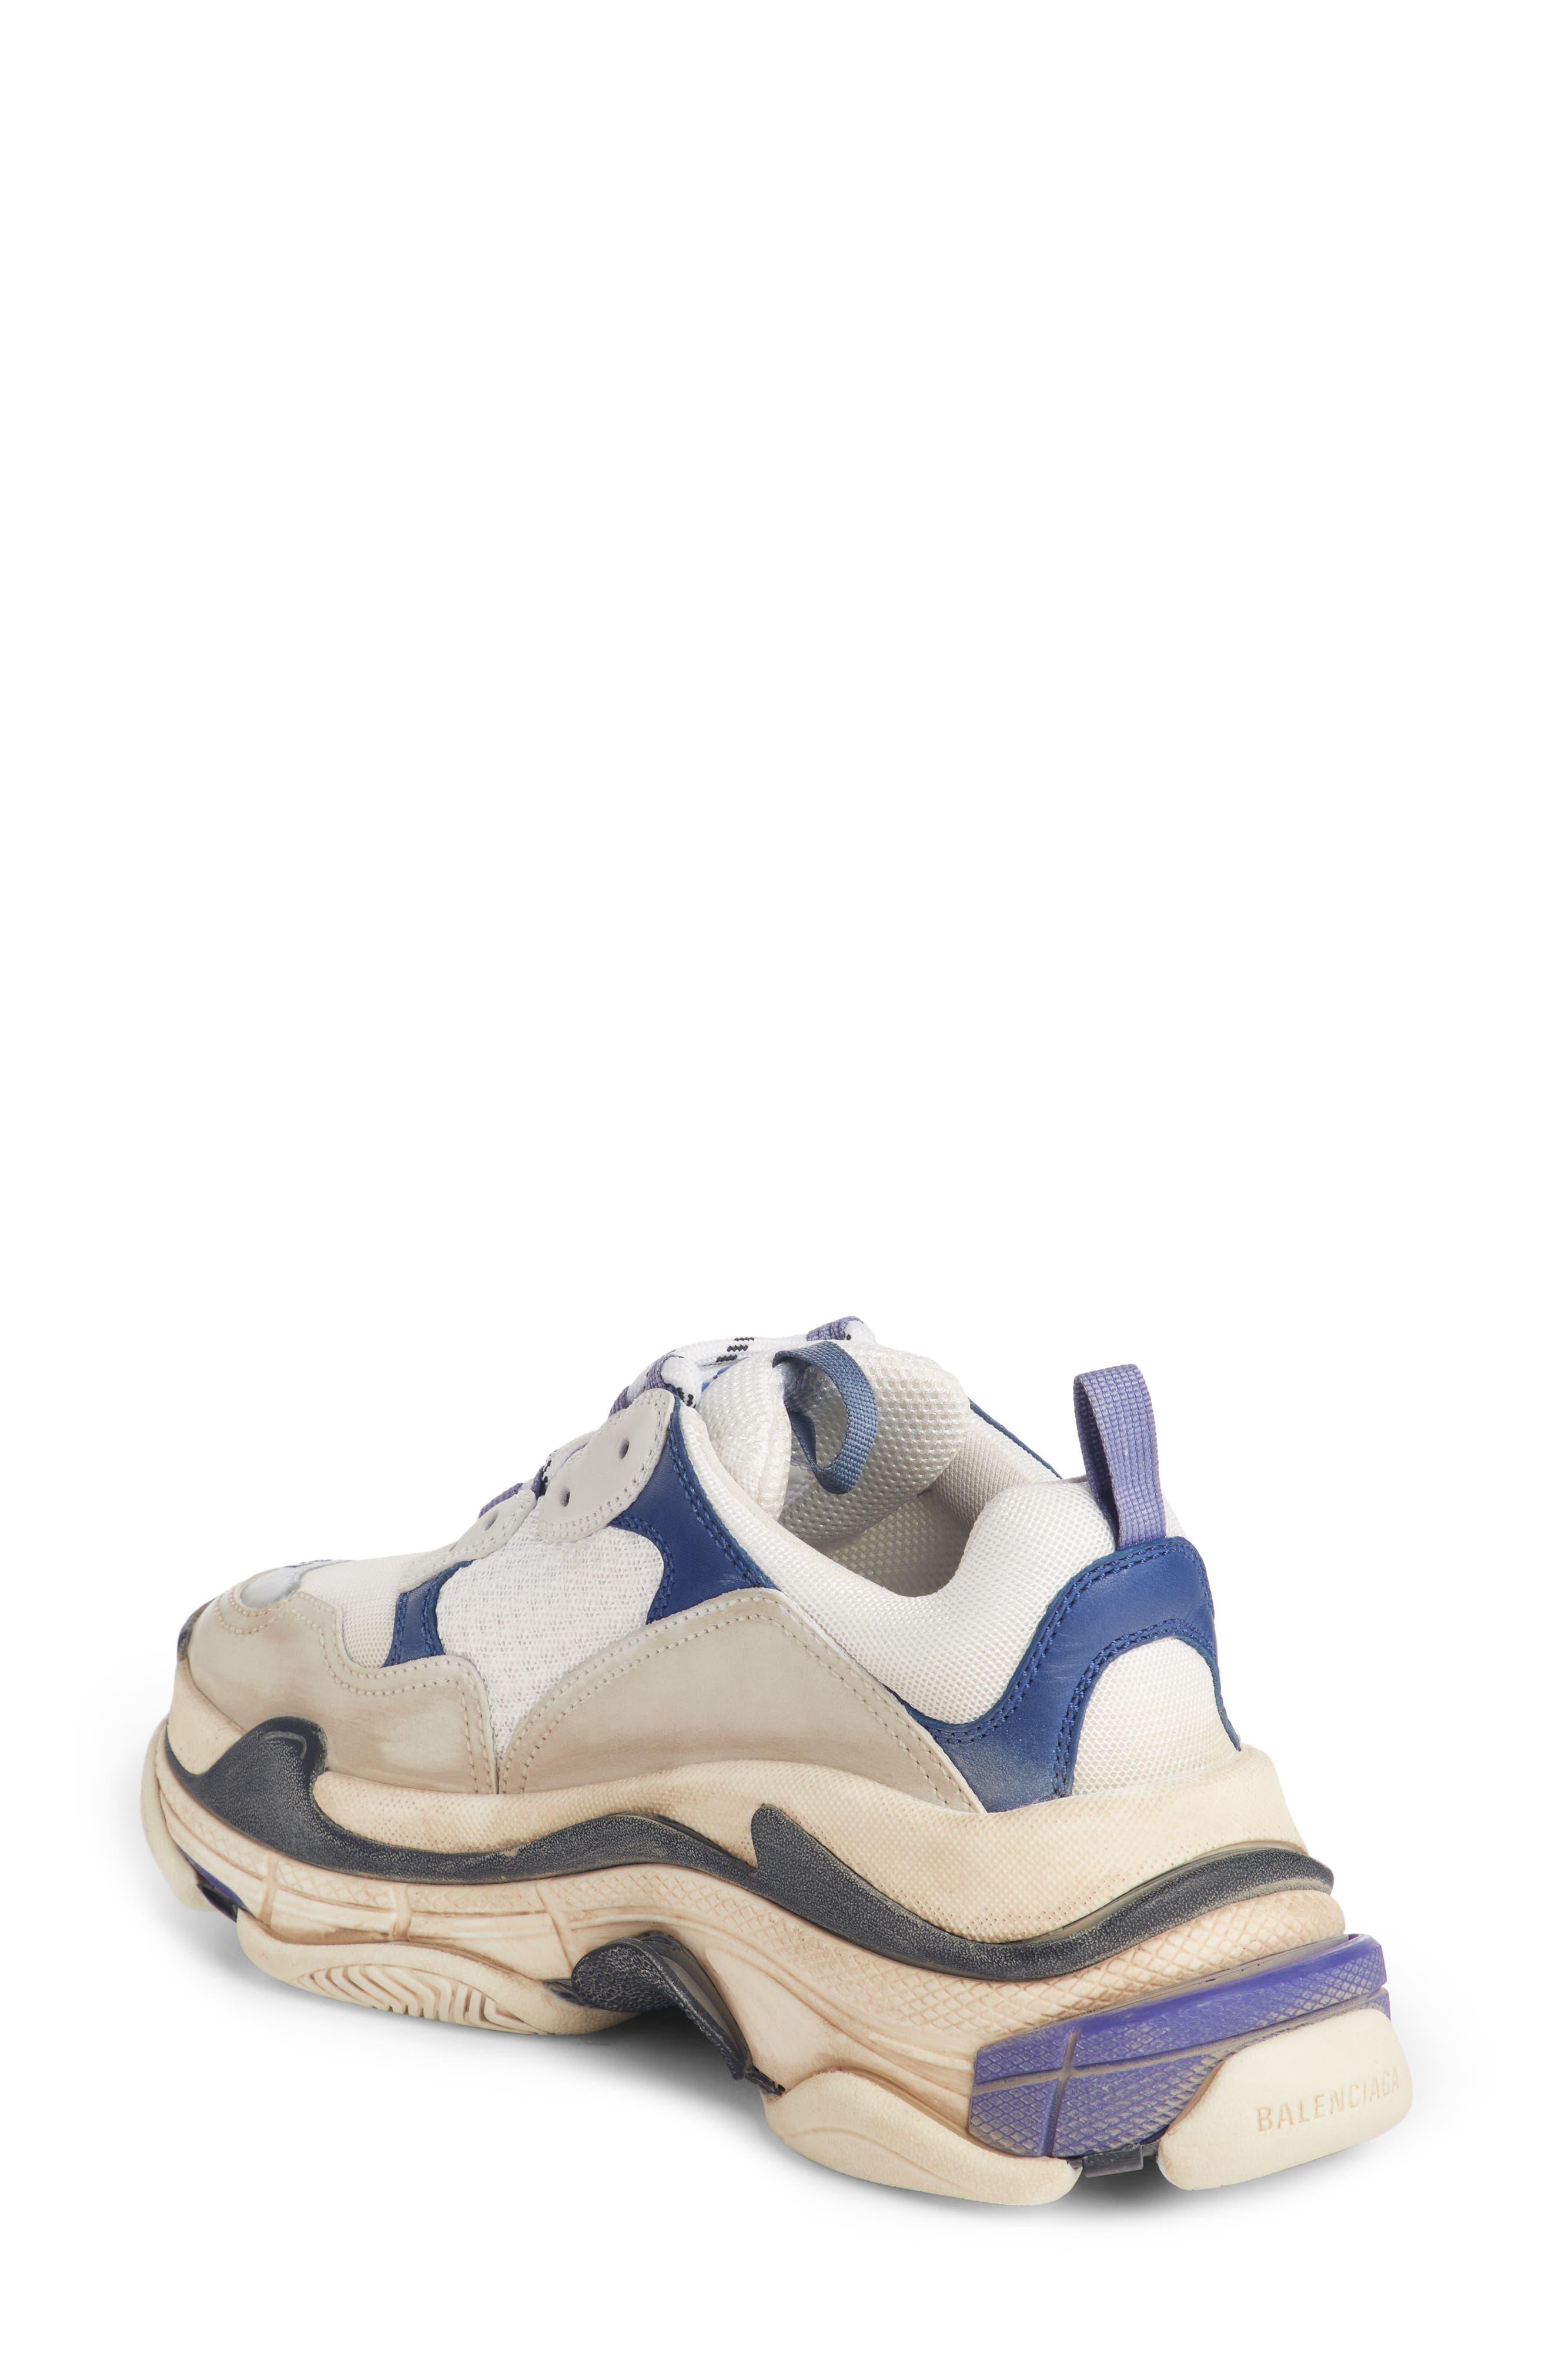 Triple S Sneaker,                             Alternate thumbnail 2, color,                             VIOLET/ WHITE/ BLUE